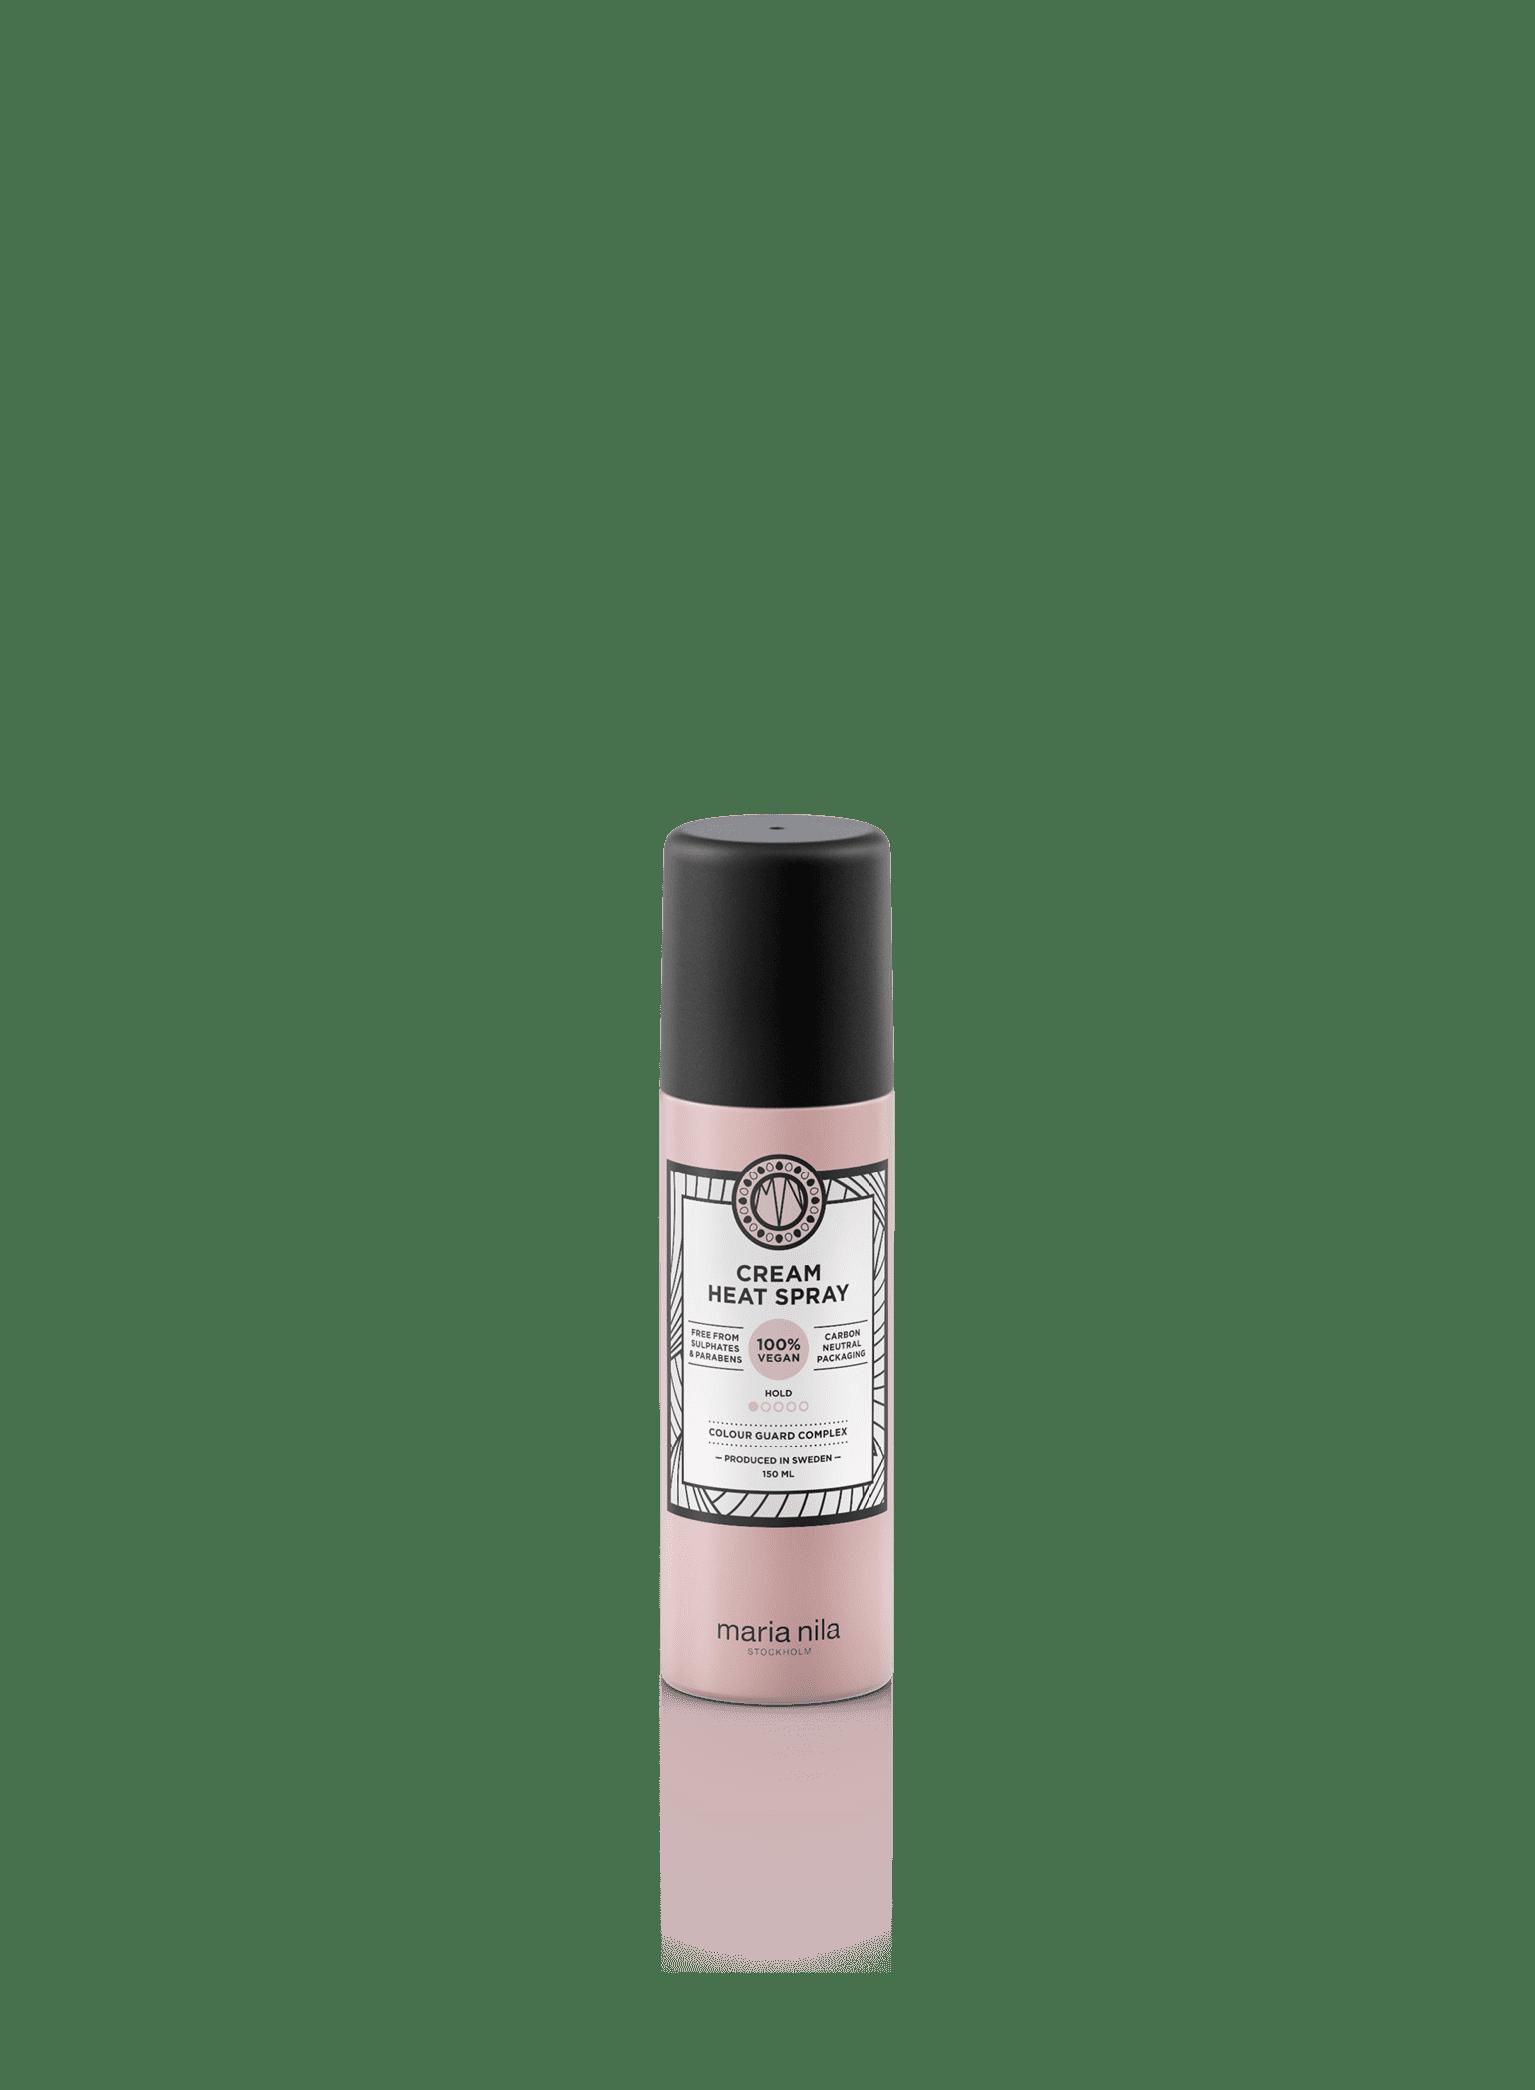 Cream Heat Spray 150 ml